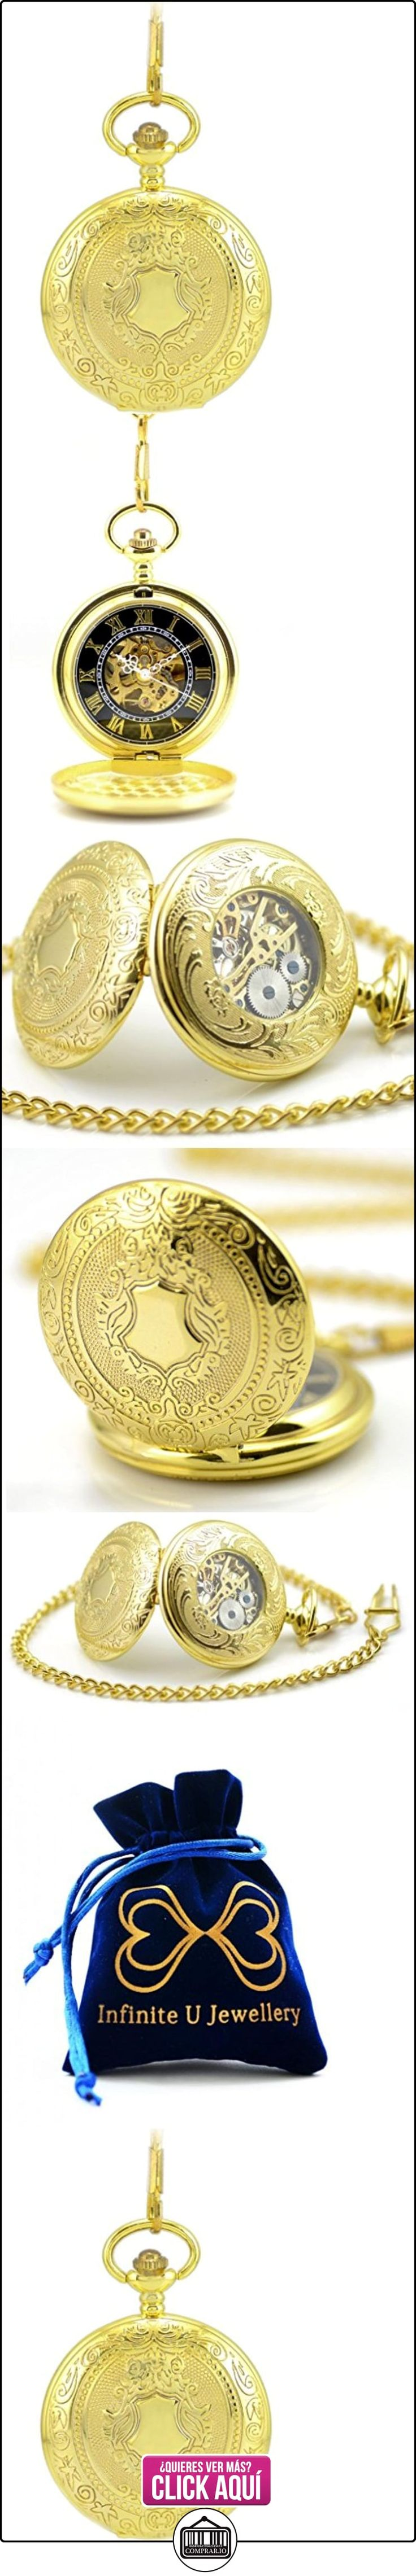 Infinite U Esqueleto Hueco Vintage Retro Colgante Collar Cuerda Manual Reloj de Bolsillo Mecánico -Color Dorado  ✿ Joyas para mujer - Las mejores ofertas ✿ ▬► Ver oferta: https://comprar.io/goto/B00OMSYGBK